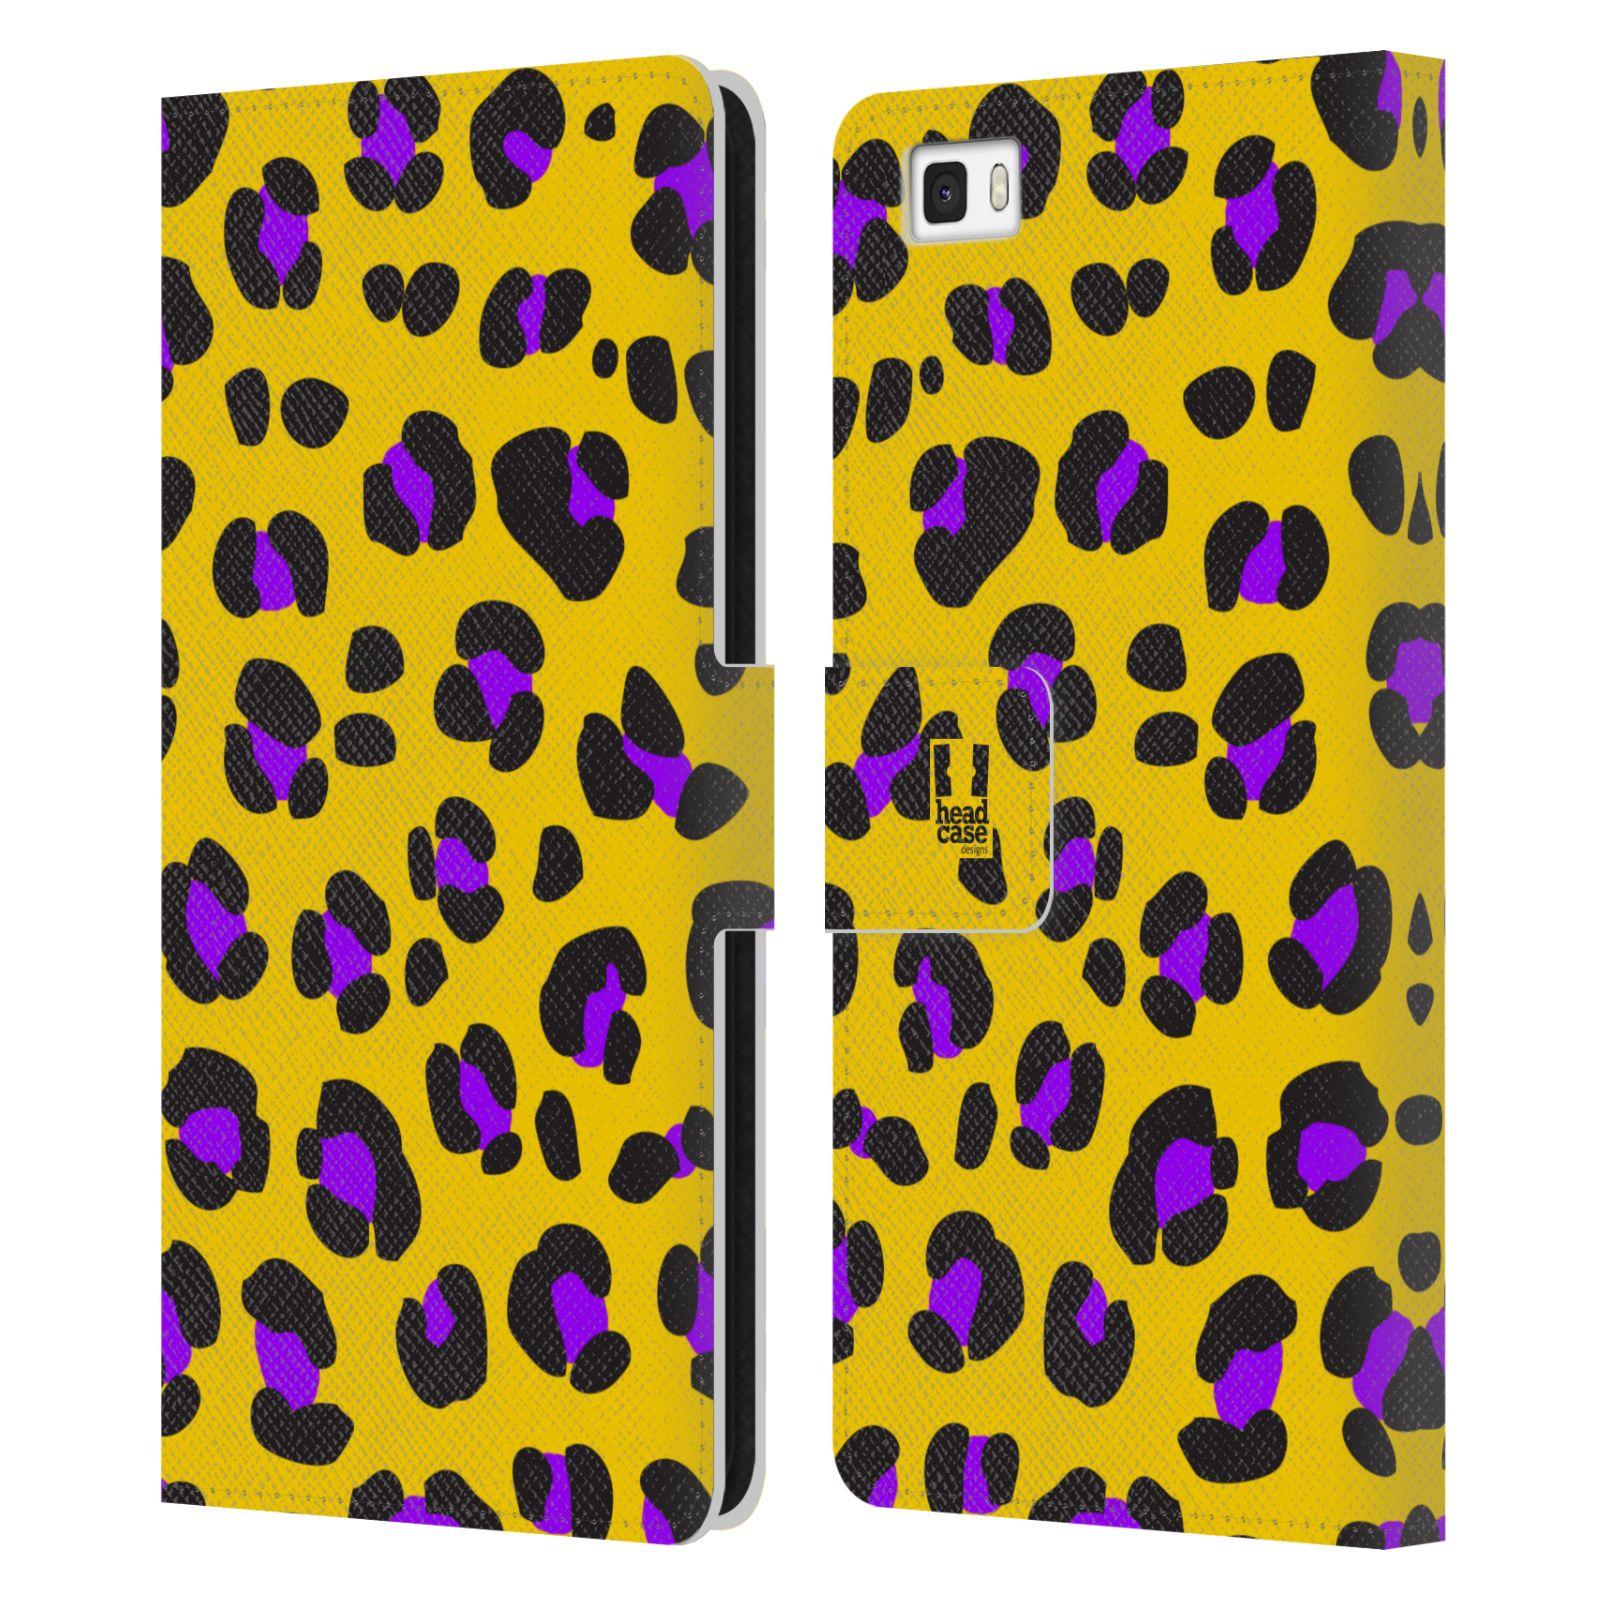 HEAD CASE Flipové pouzdro pro mobil Huawei P8 LITE Zvířecí barevné vzory žlutý leopard fialové skvrny